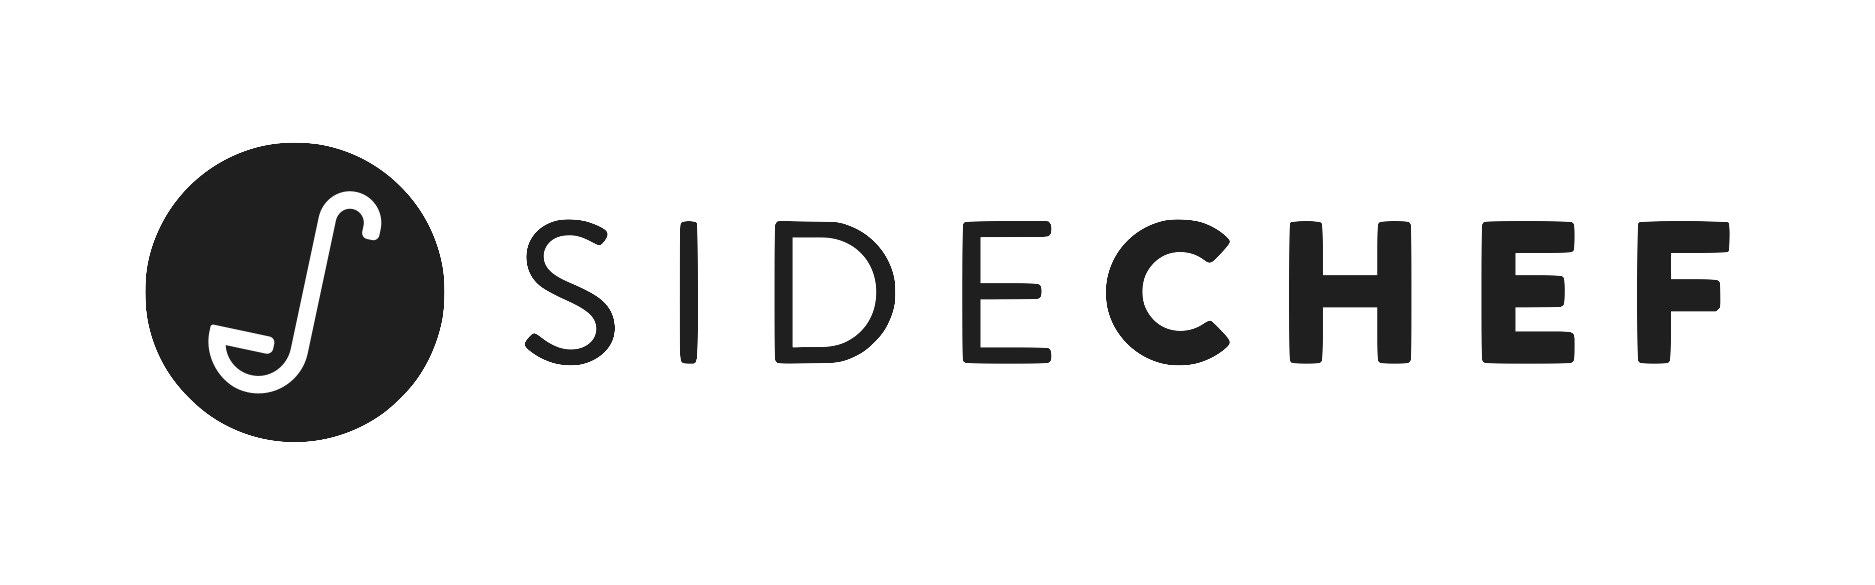 Sidechef_logo.png